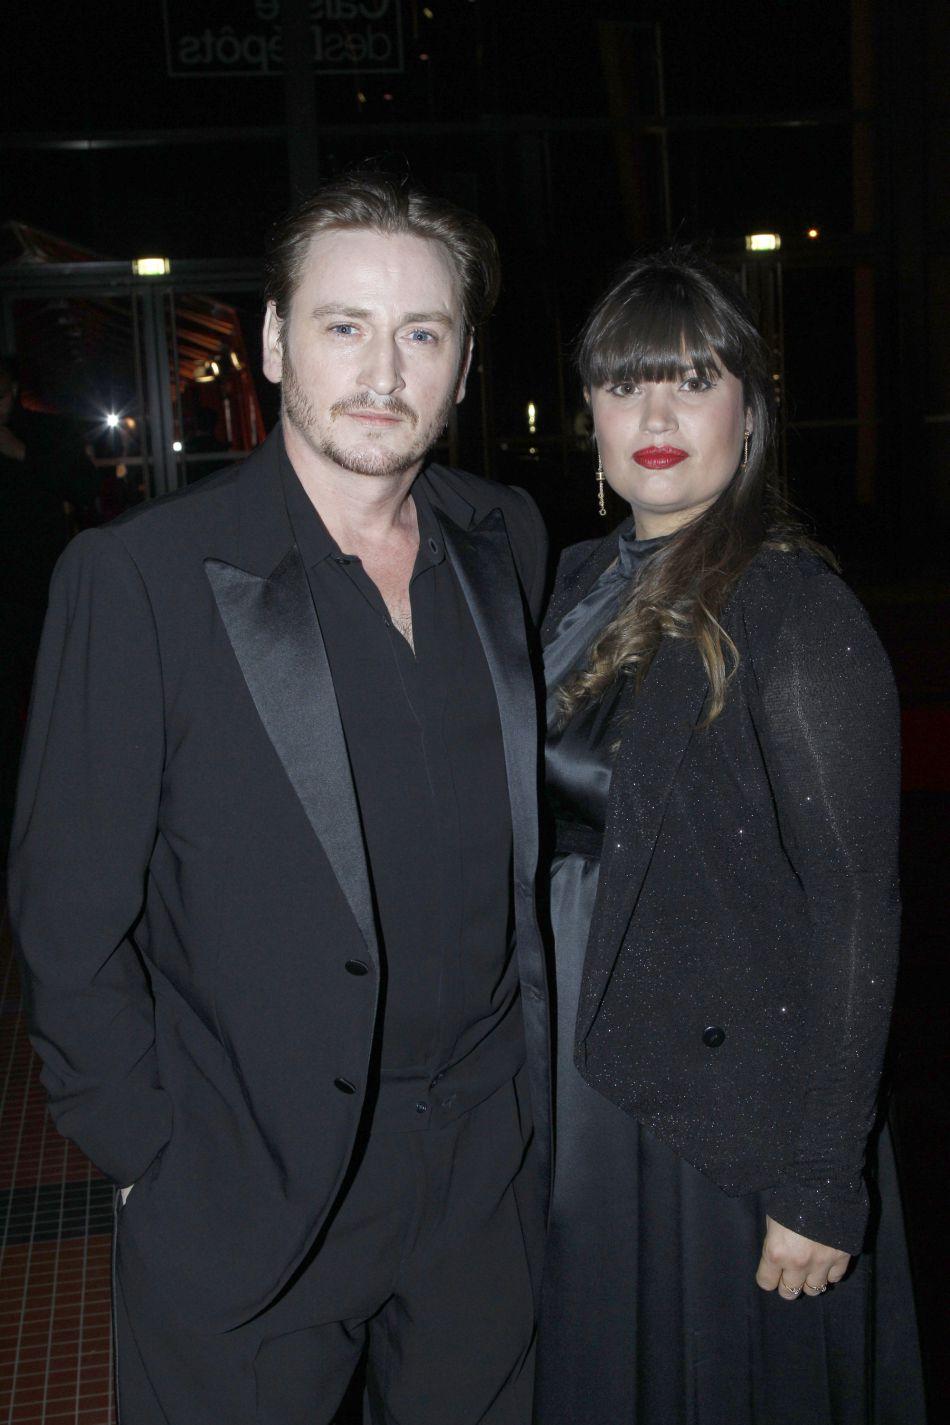 Benoît Magimel et Nikitaont eu une fille, prénommée Djinia en 2011.